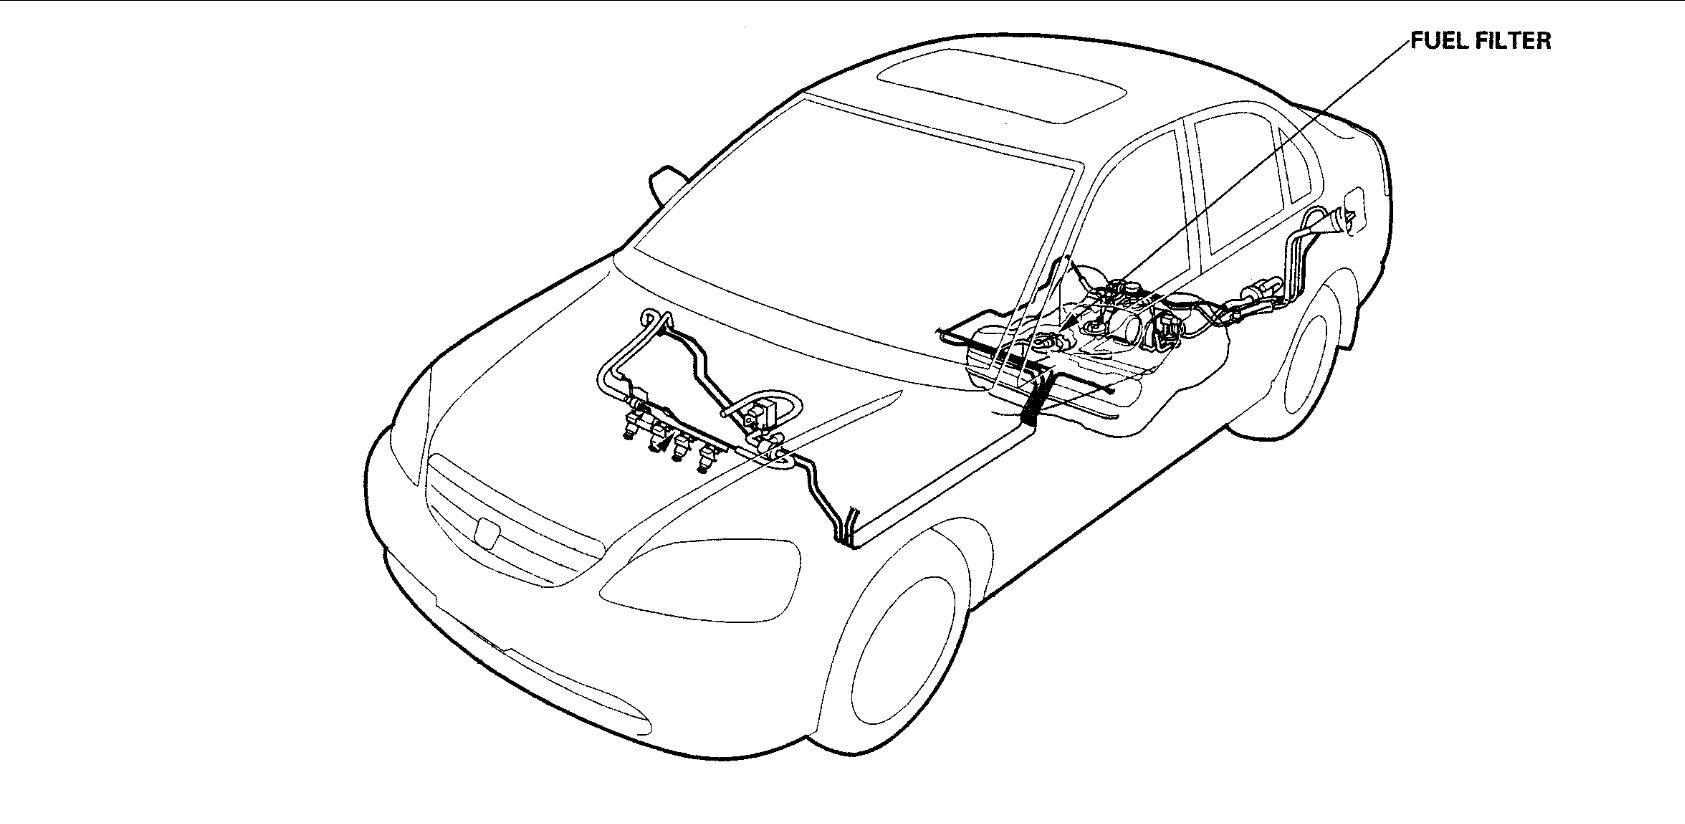 -2001 Honda Civic Ex Fuel Filter Replacement di 2020